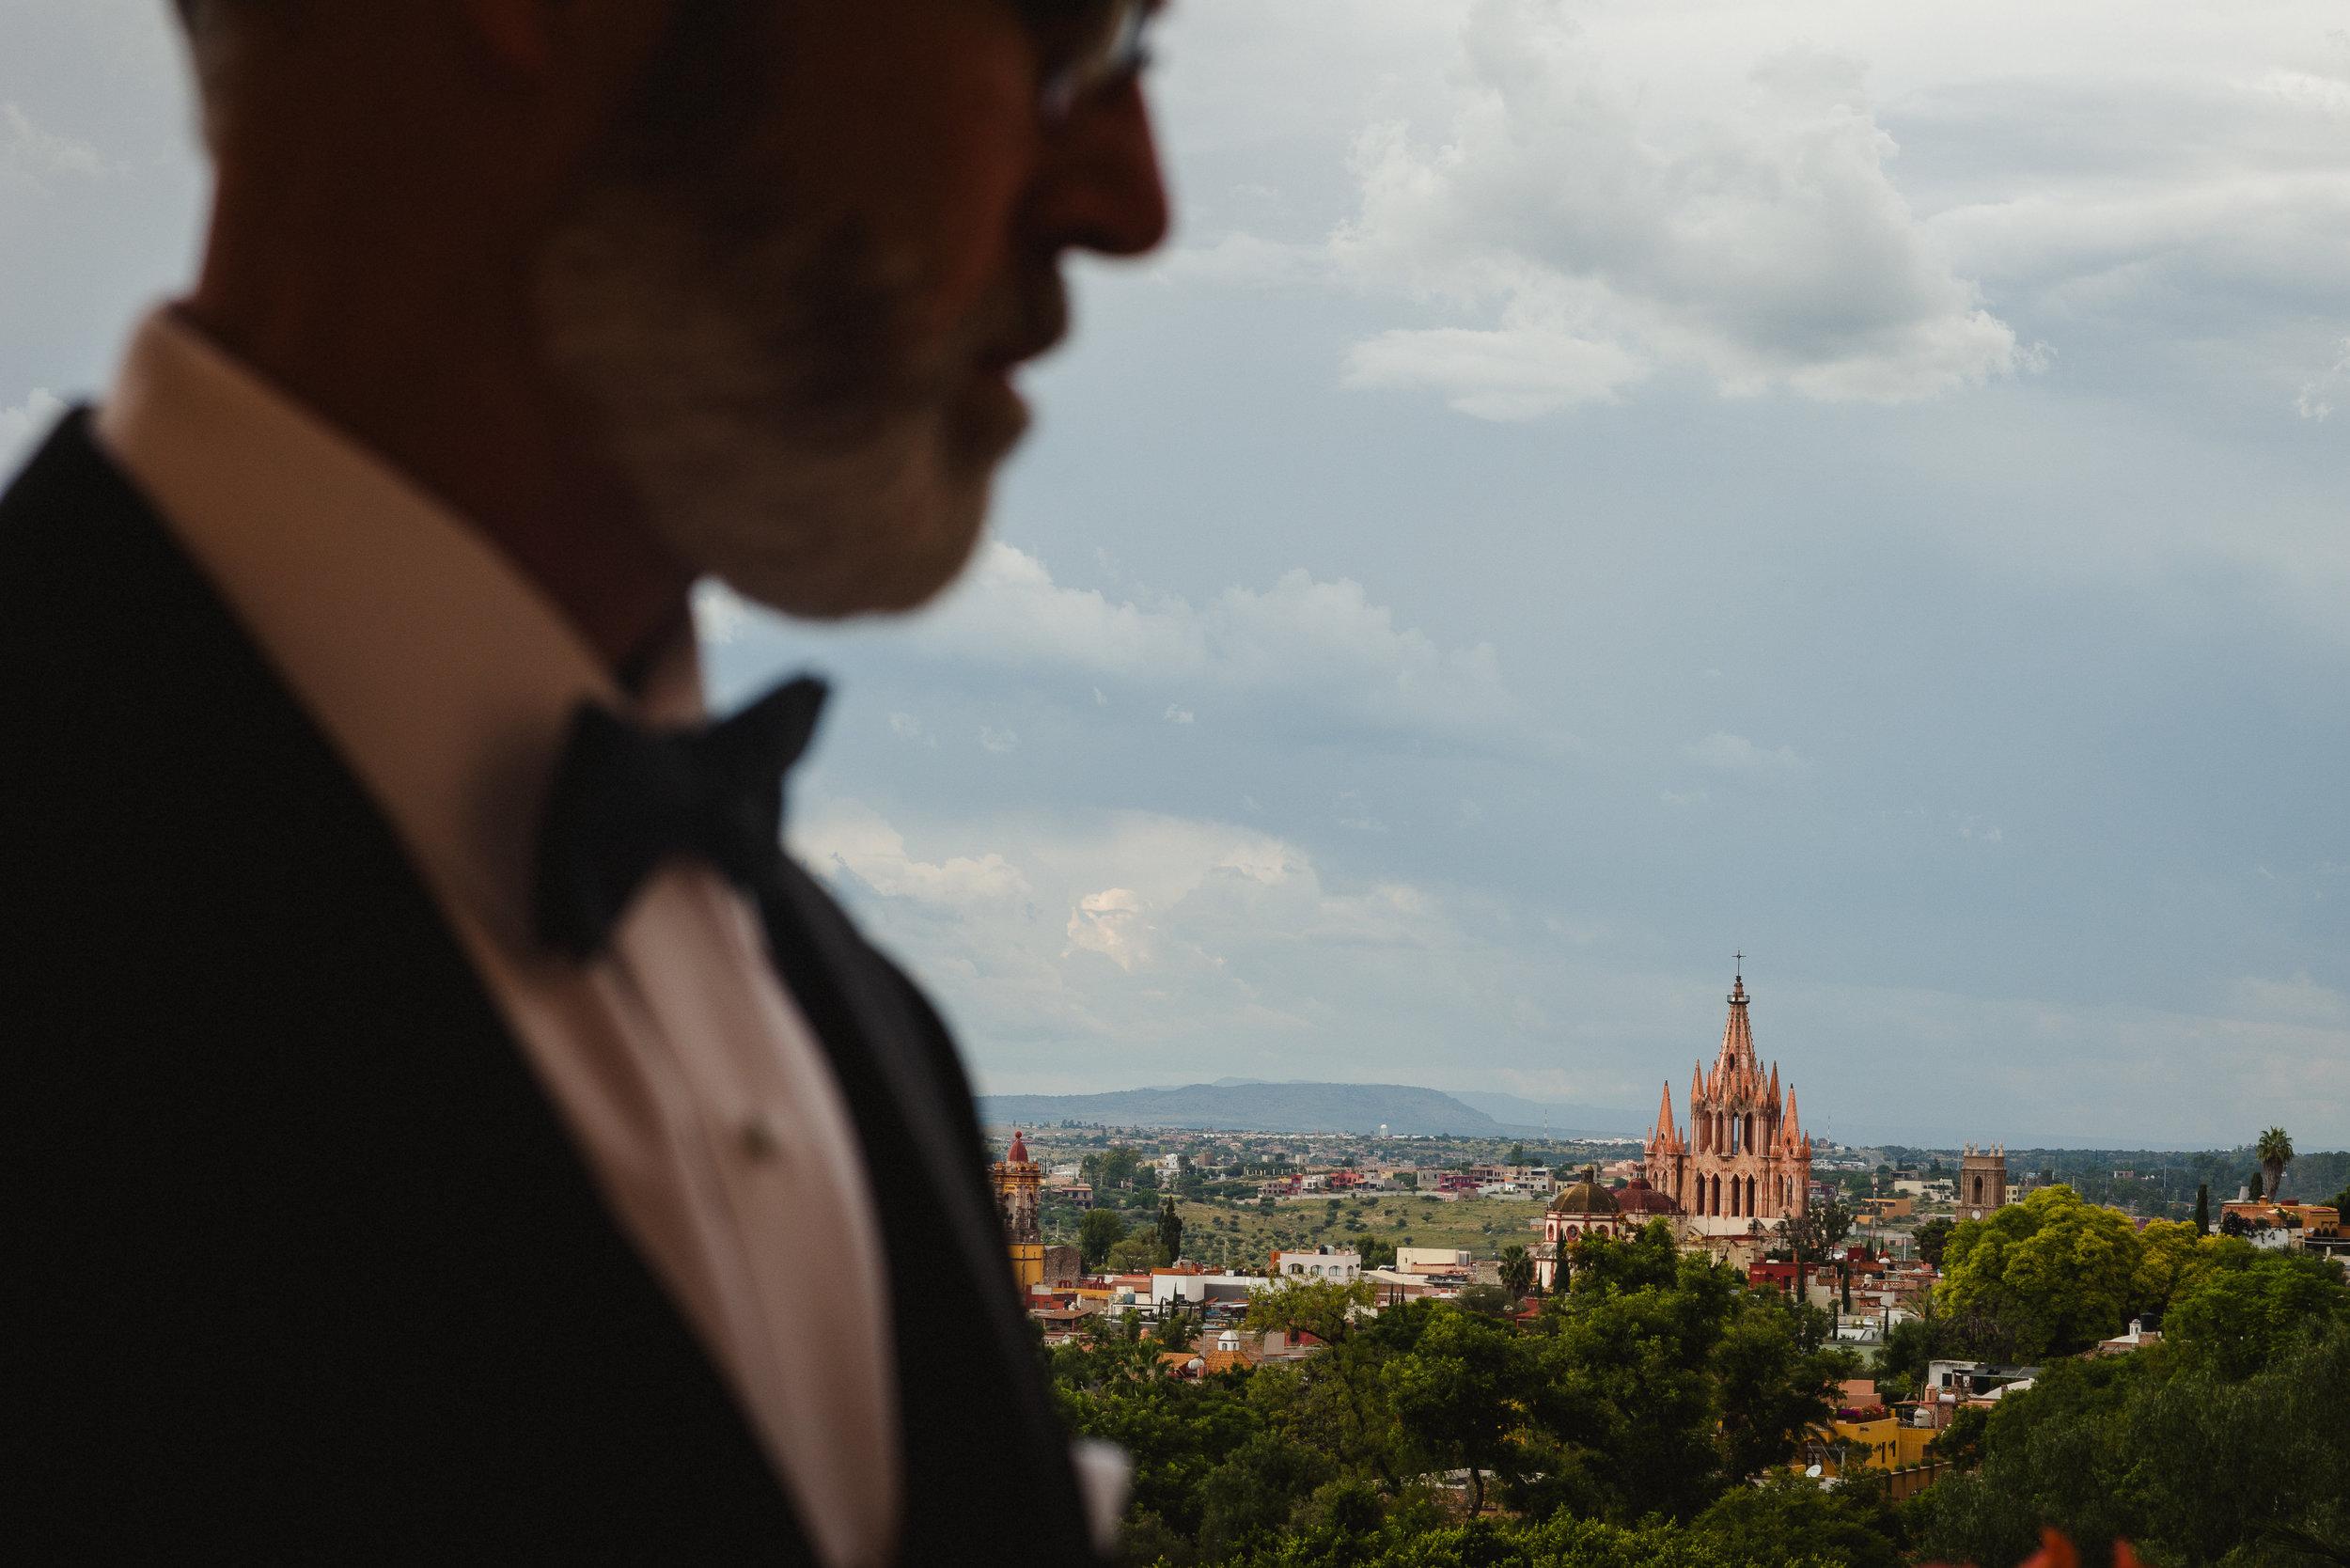 MaurizioSolisBroca-casa-carino-san-miguel-de-allende-wedding-31.jpg